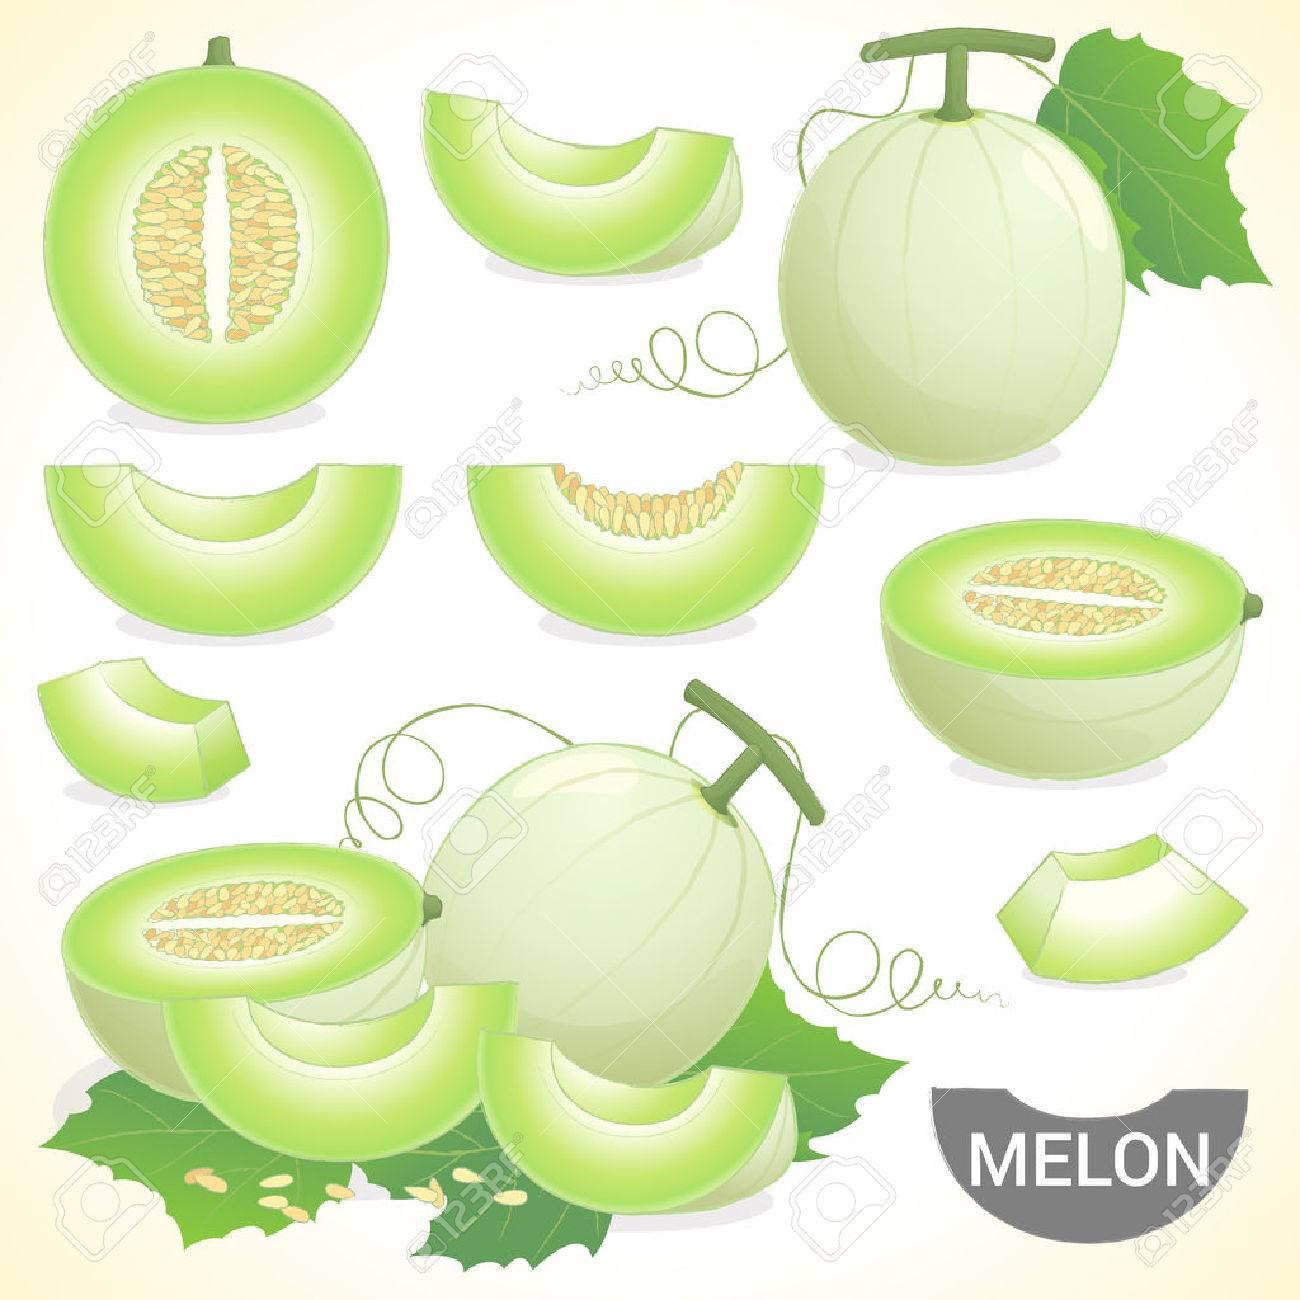 Set of cantaloupe honeydew honeymelon fruit in various styles vector format - 47180832